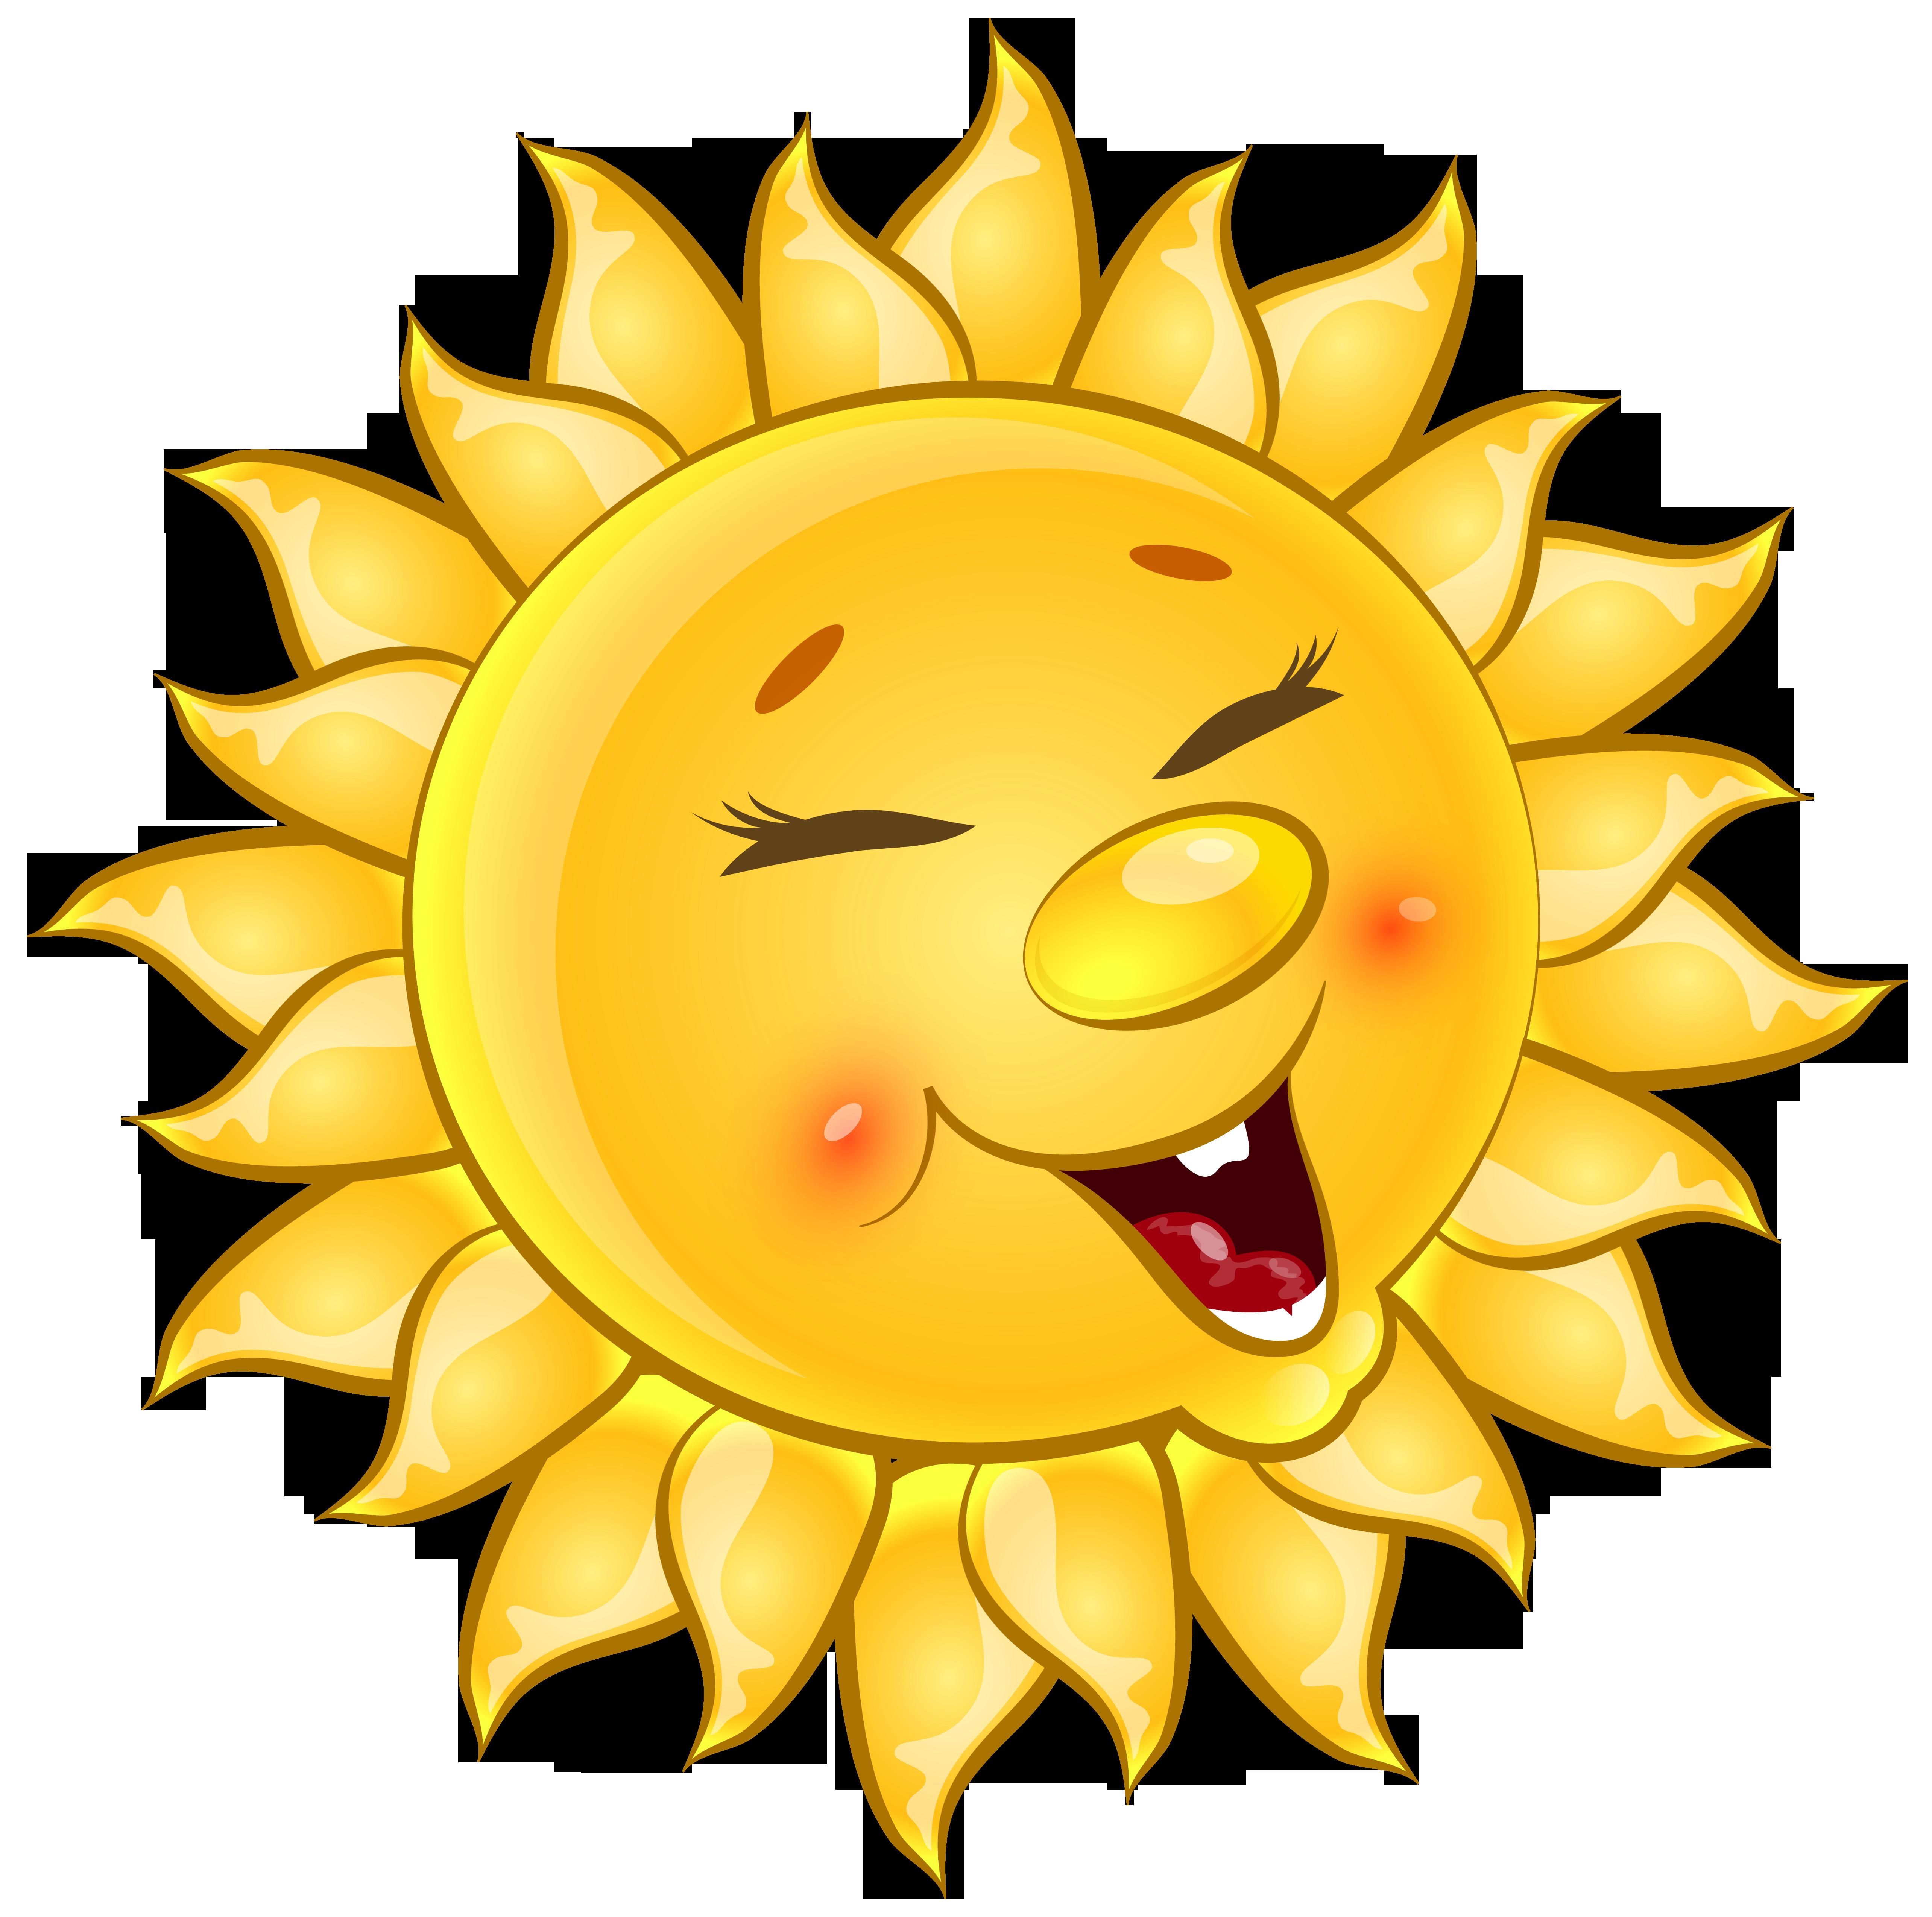 Cute sun with shades cartoon clipart clip art freeuse download Transparent Cute Sun Cartoon PNG Clipart Picture | Gallery ... clip art freeuse download